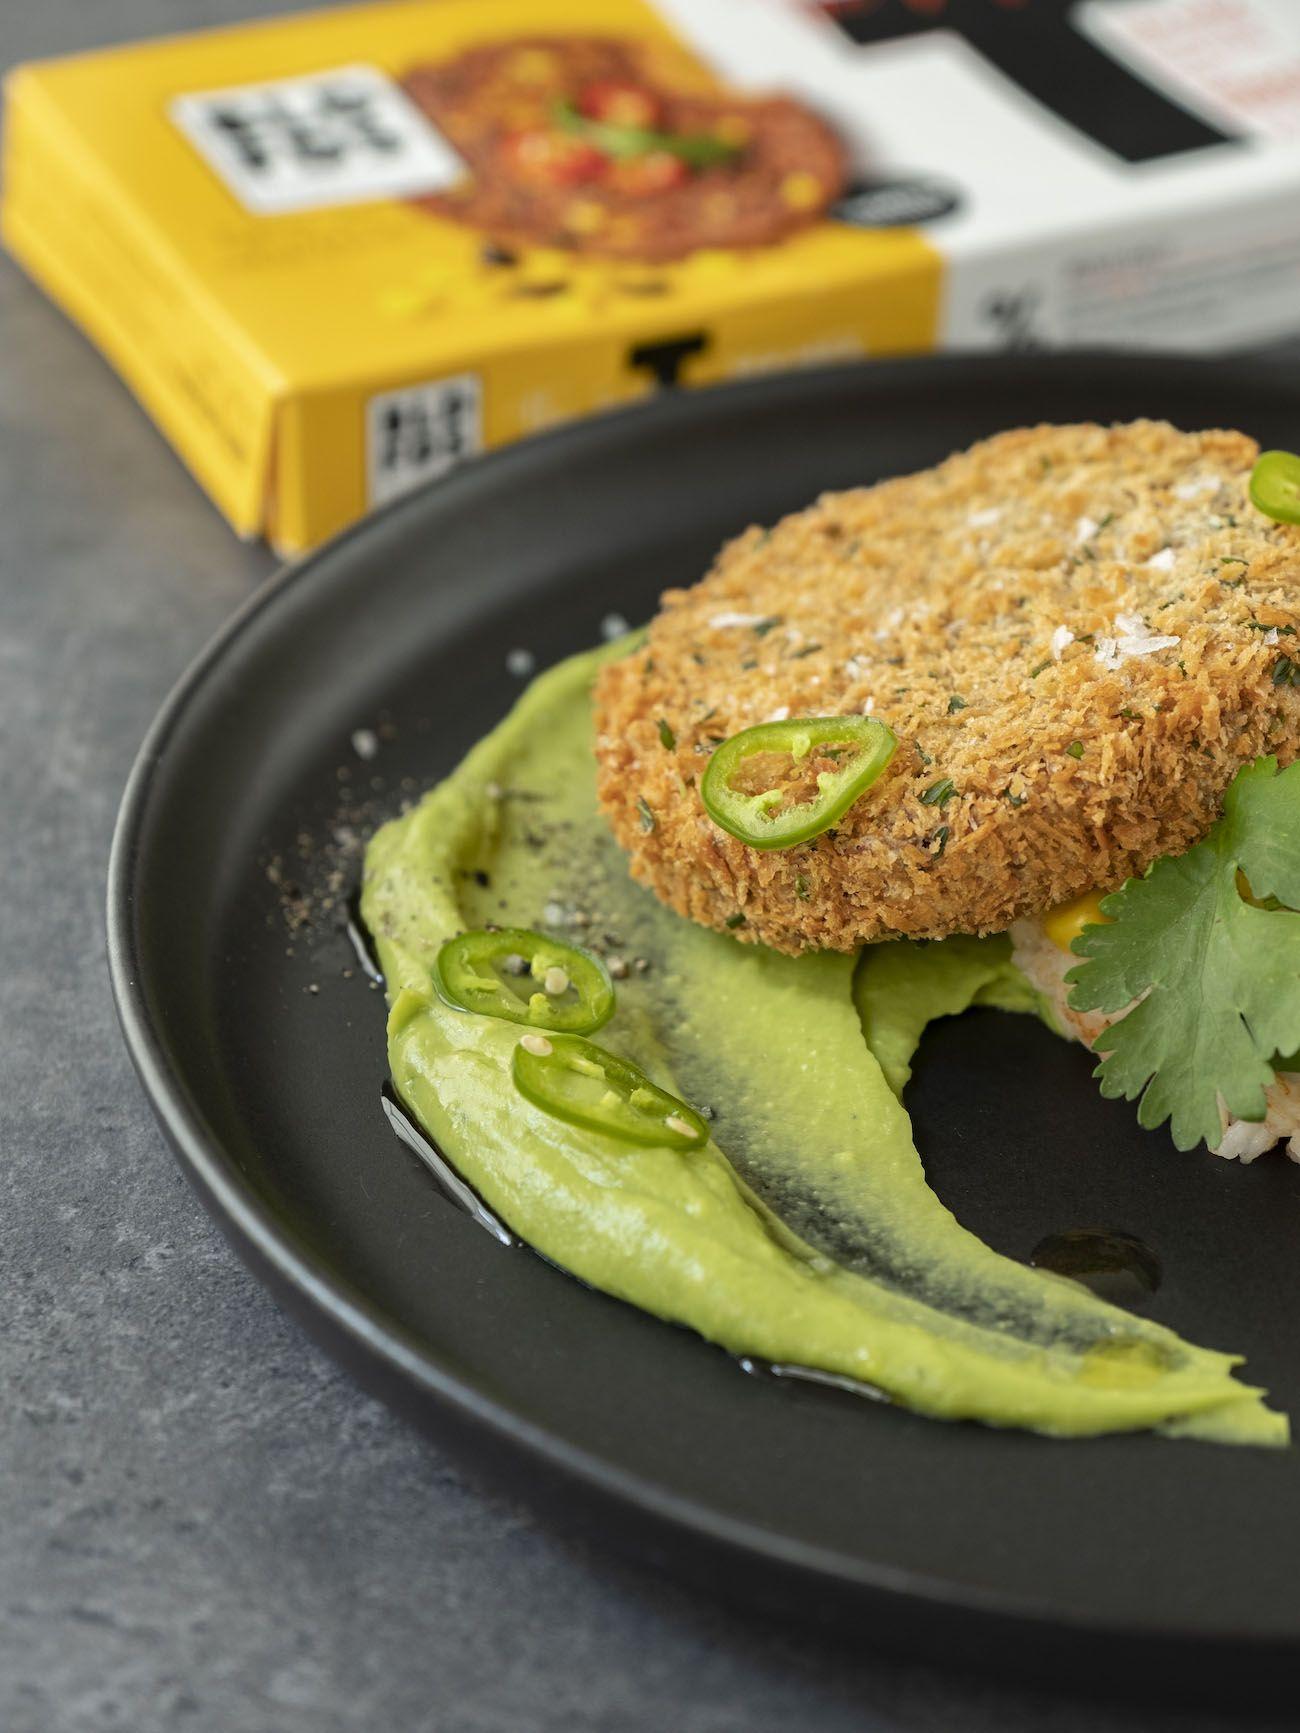 About Fuel, Foodblog, Bold Foods, Rezept, The Big T Schnitzel mit Reis und Avocadocreme, Jalapeño